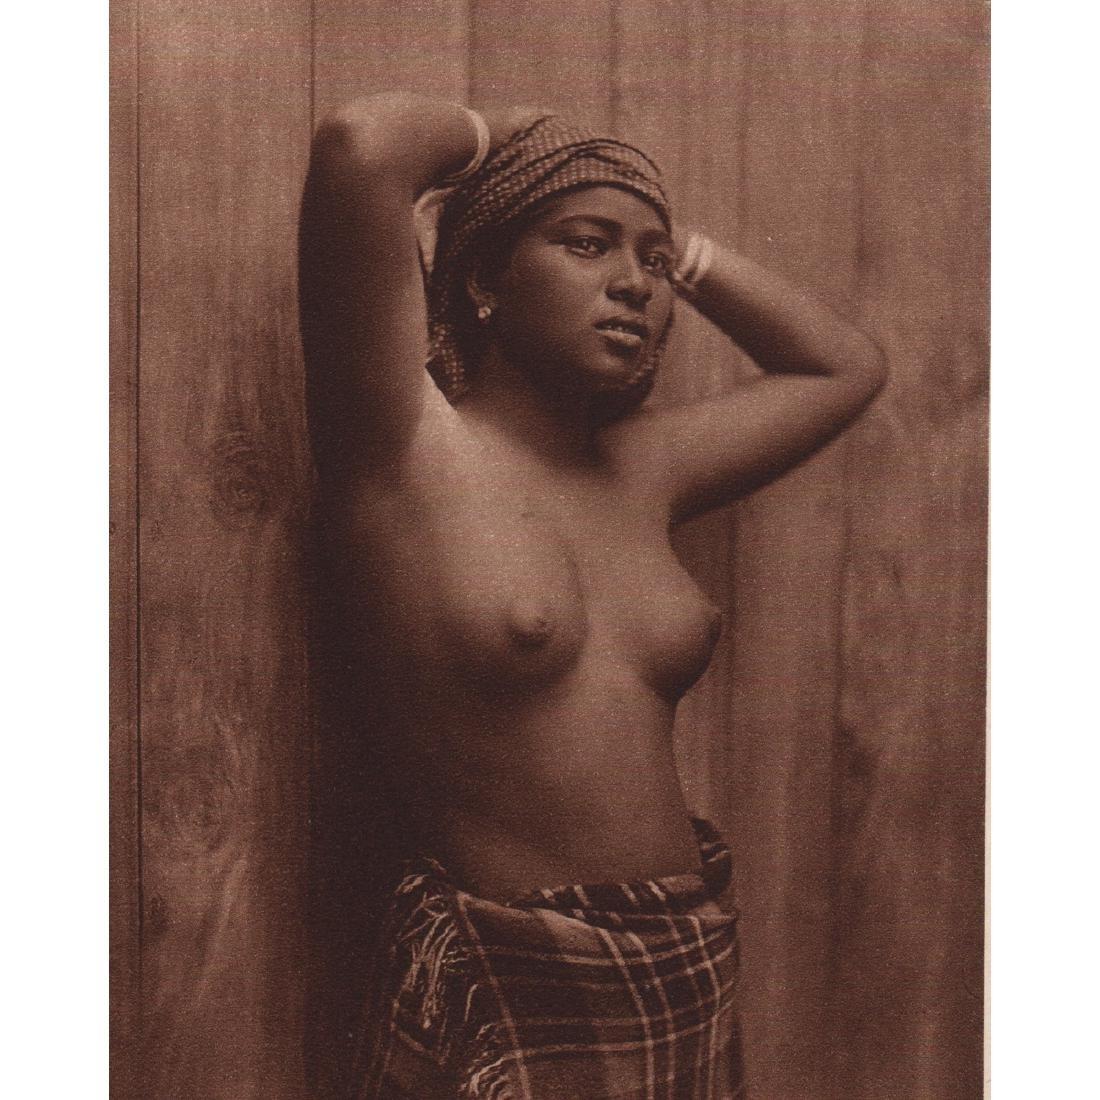 Unknown - Nude from Ceylon